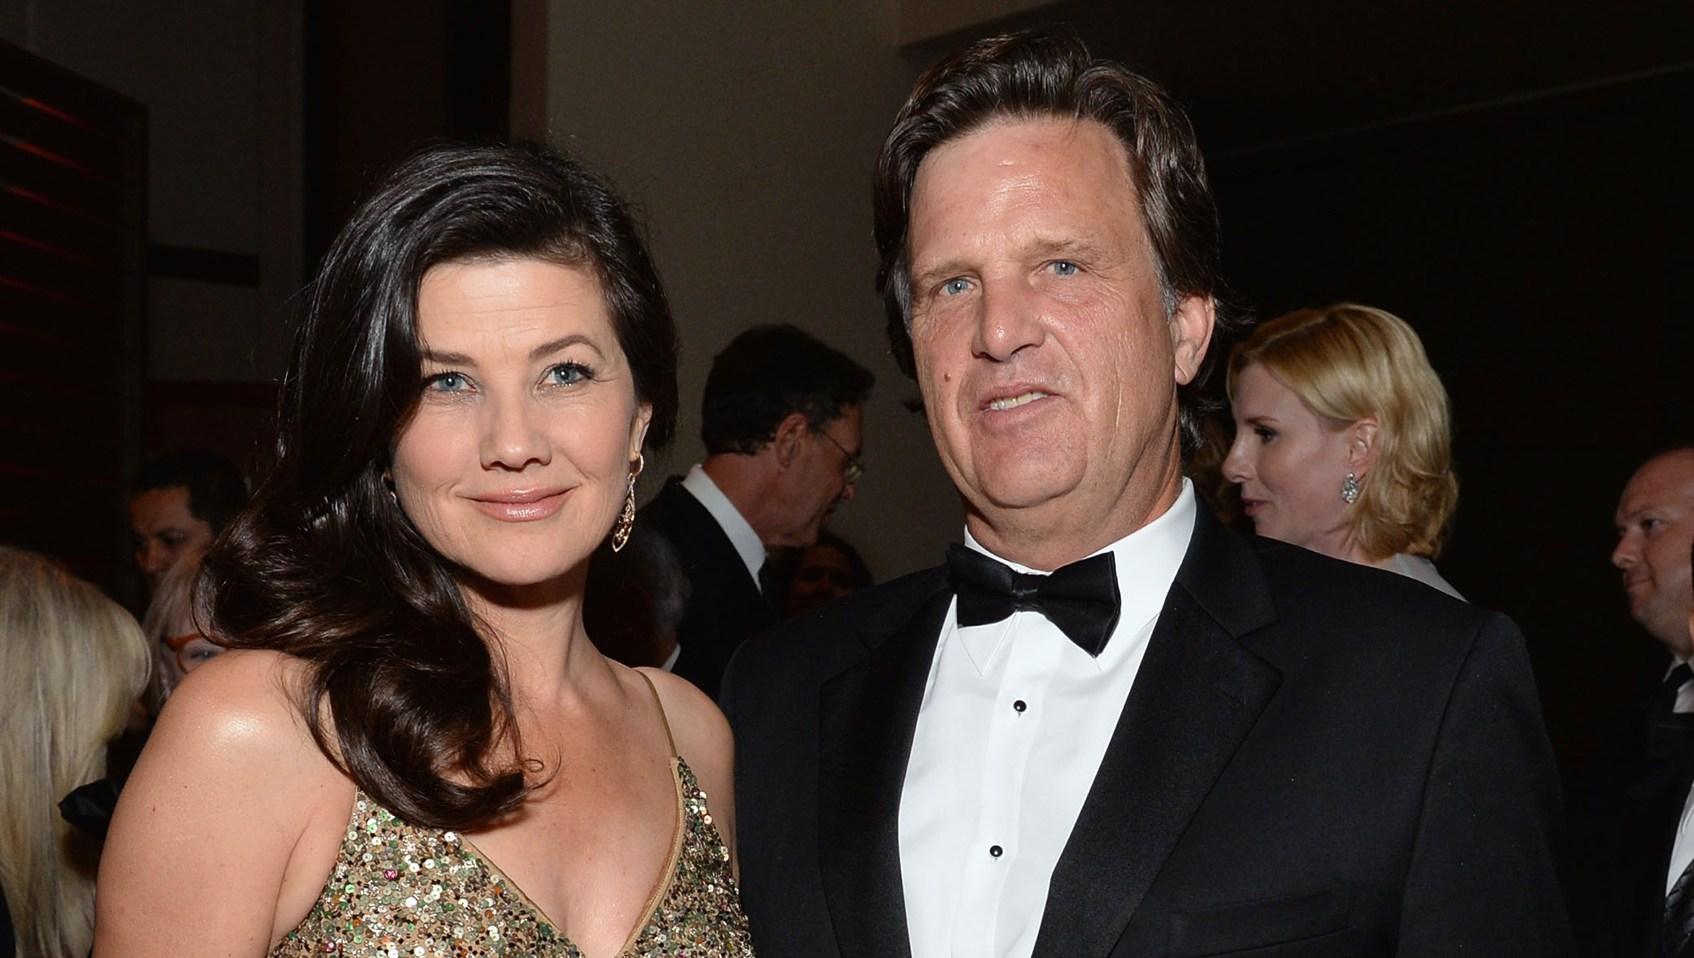 Daphne Zuniga Reveals She Is Engaged to Businessman David Mleczko